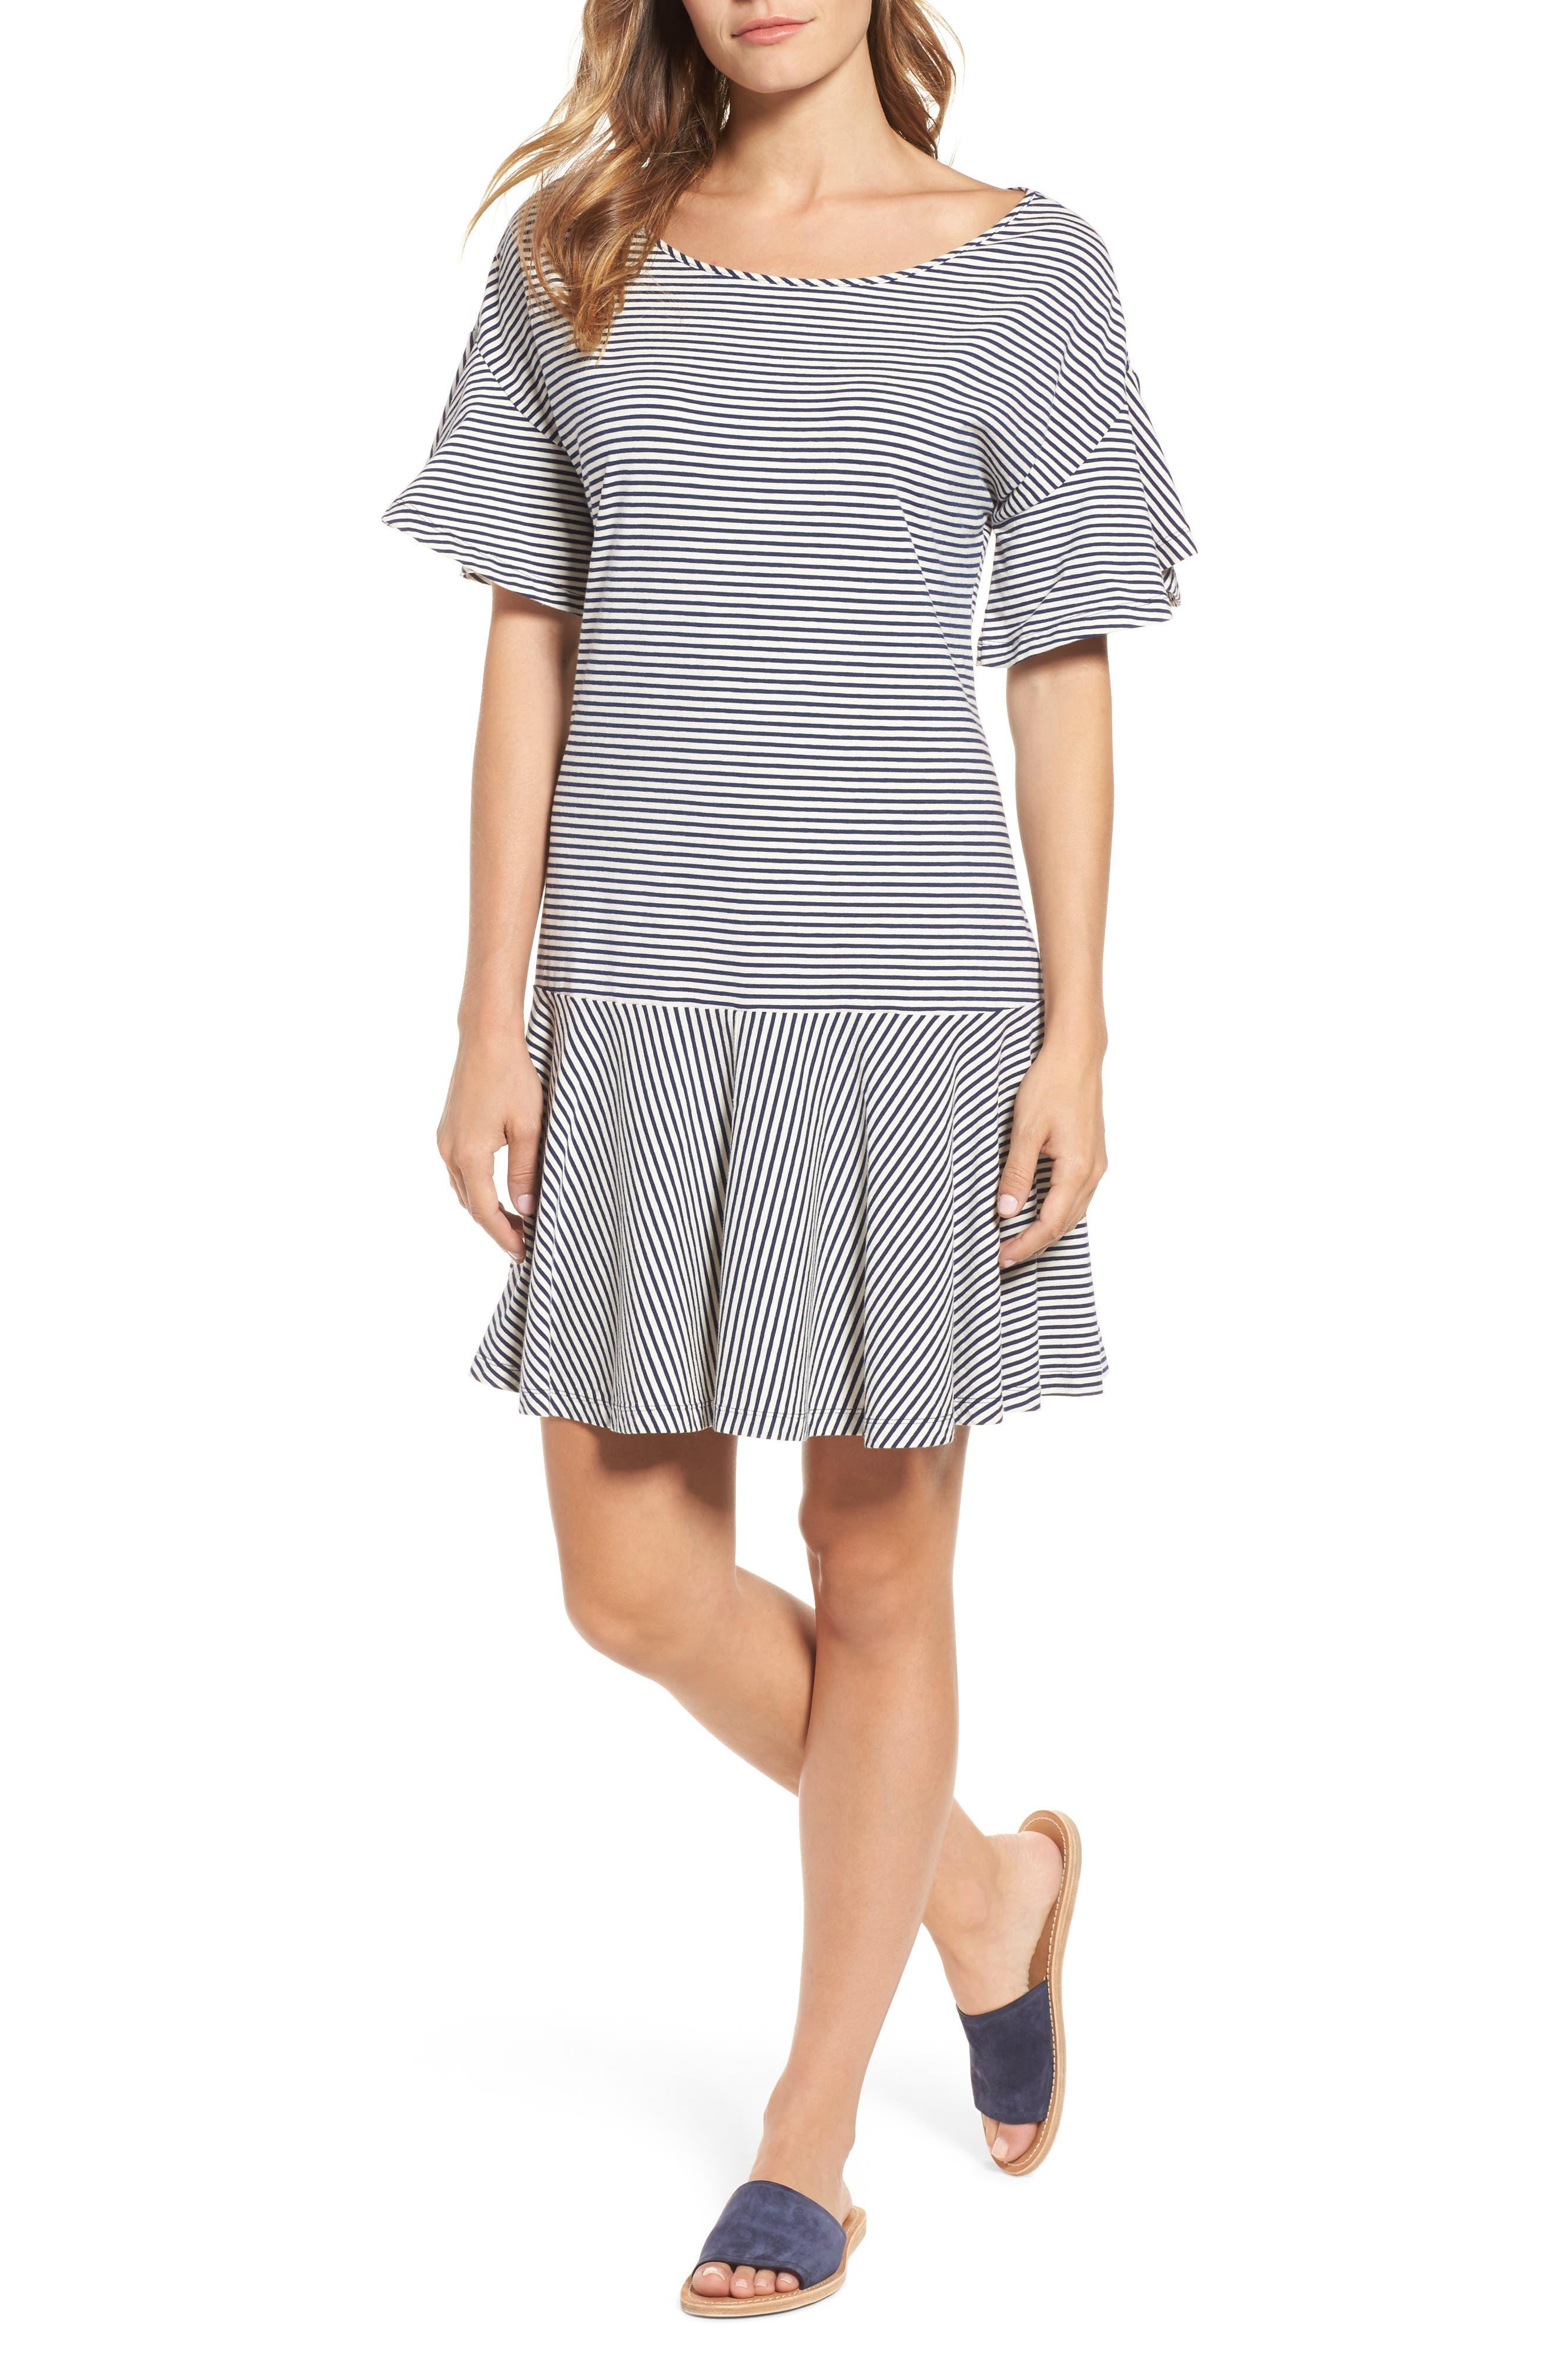 Alternate Image 1 Selected - vineyard vines Stripe Flounce Dress